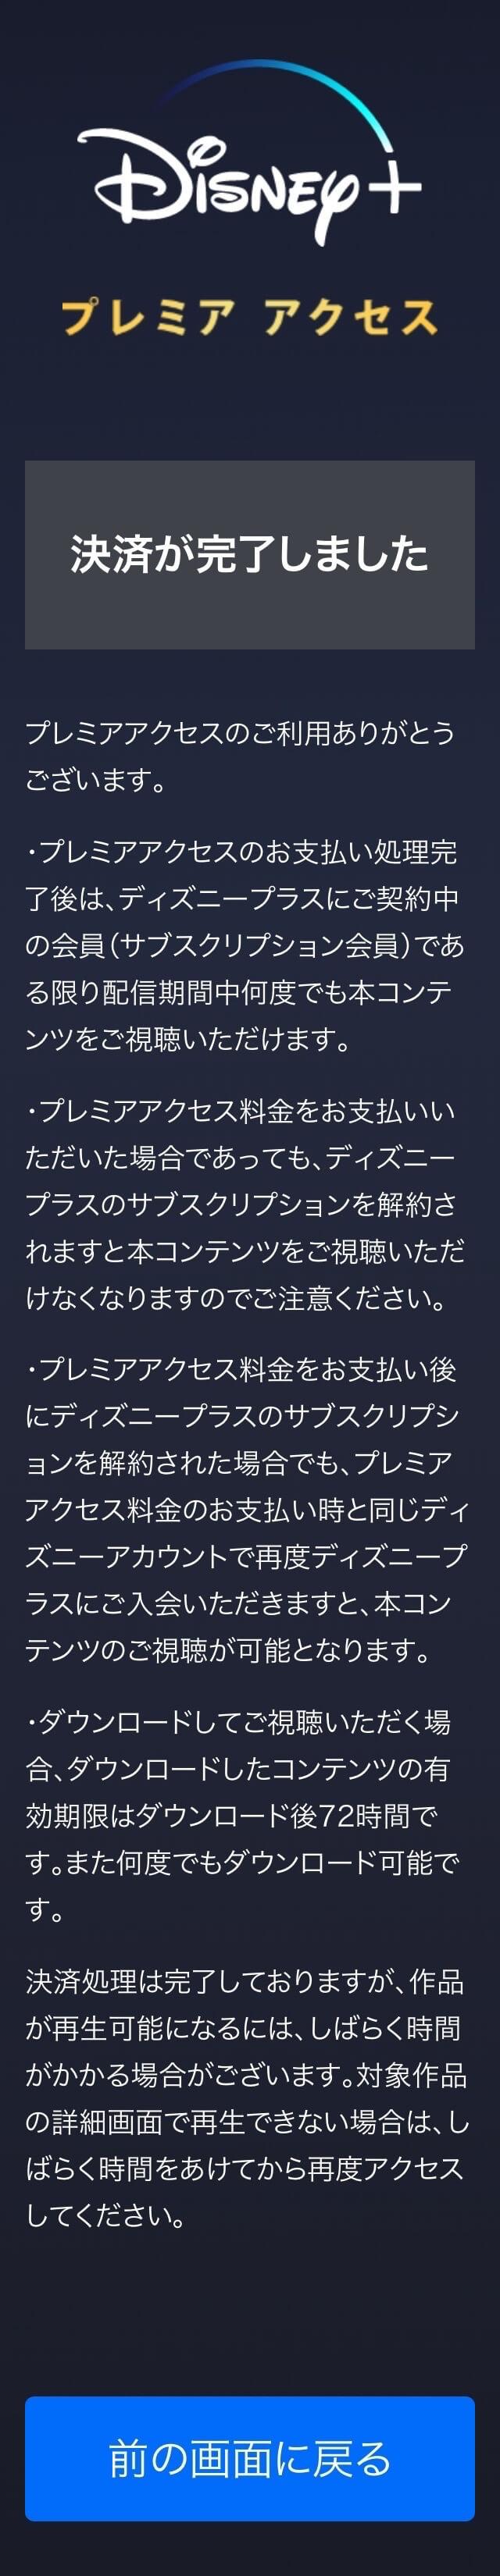 Disney+ プレミアムアクセス9